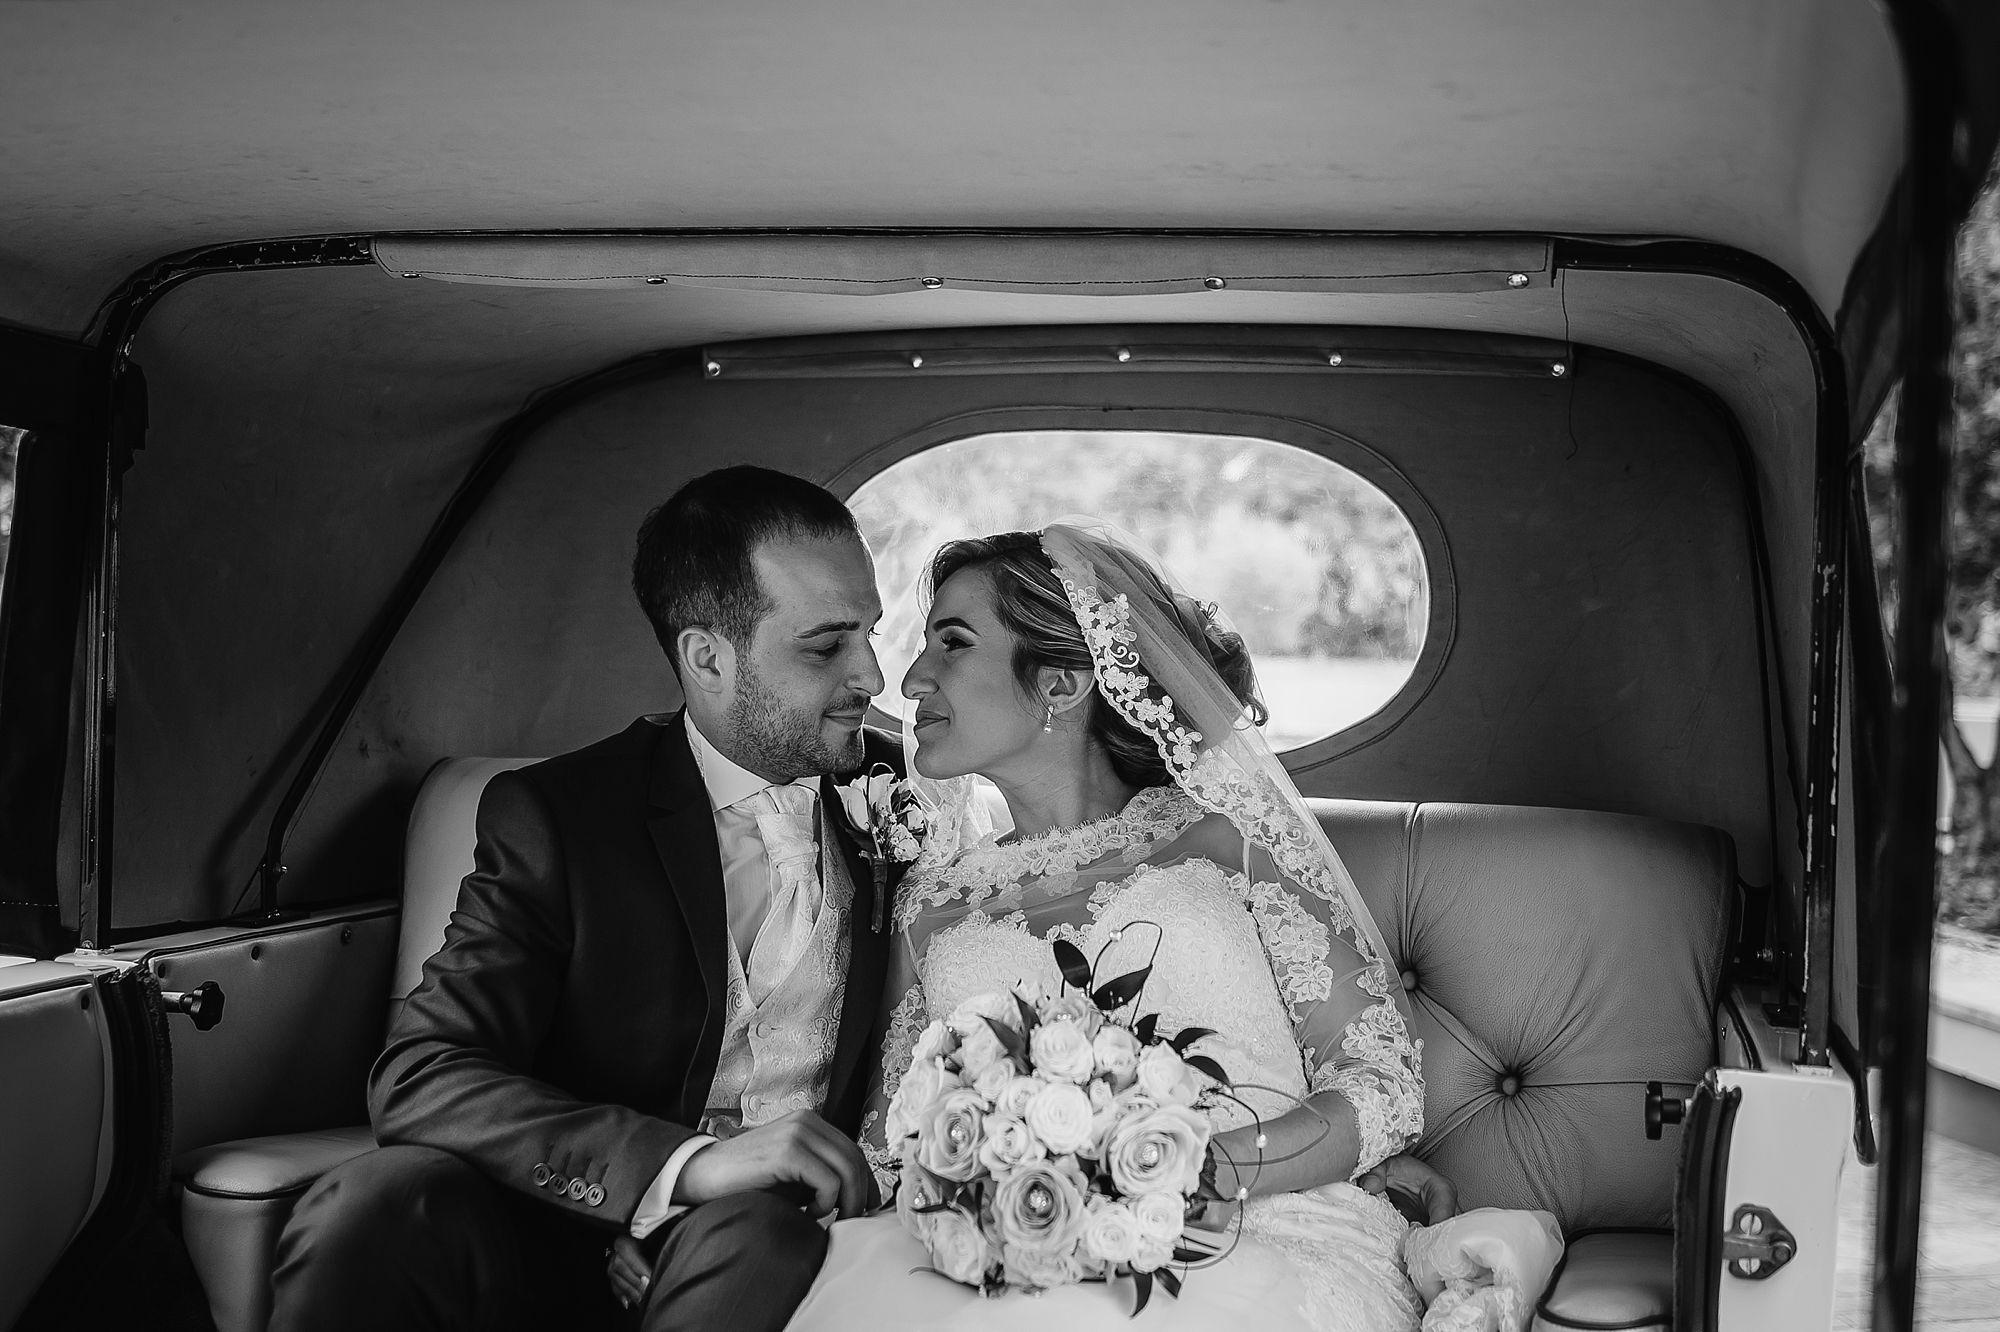 Xanthe & Kris - Xara Lodge - Wedding Photography Malta - Shane P. Watts